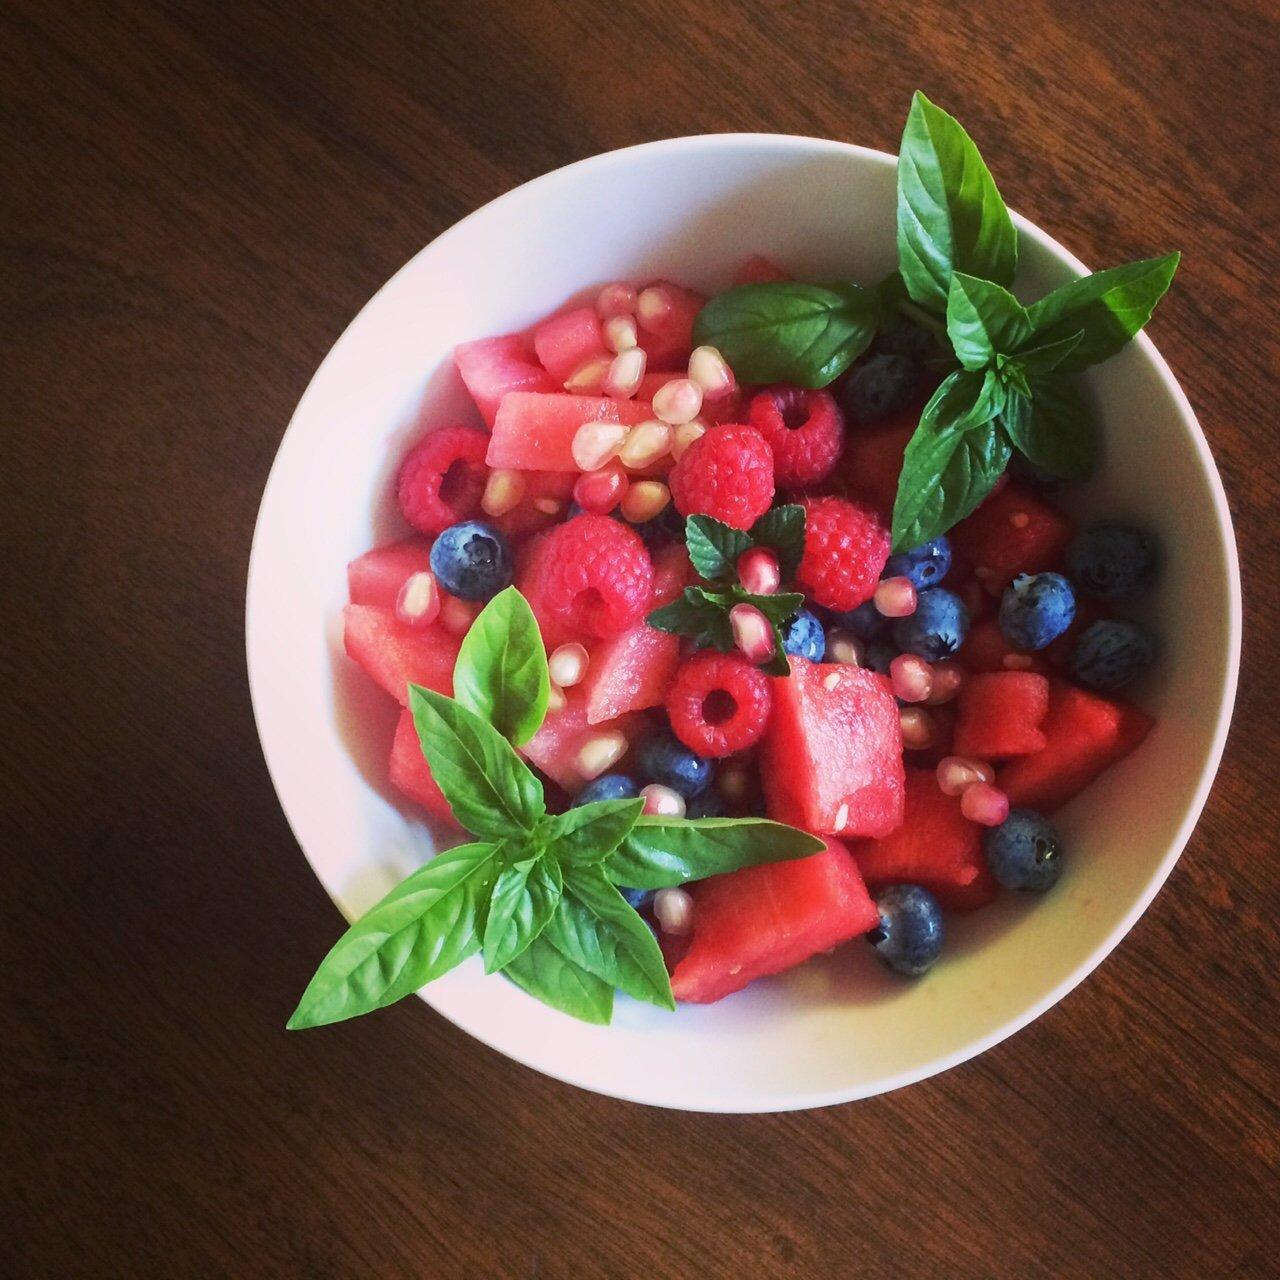 Foot Loose & Fancy Free Fruit Salad